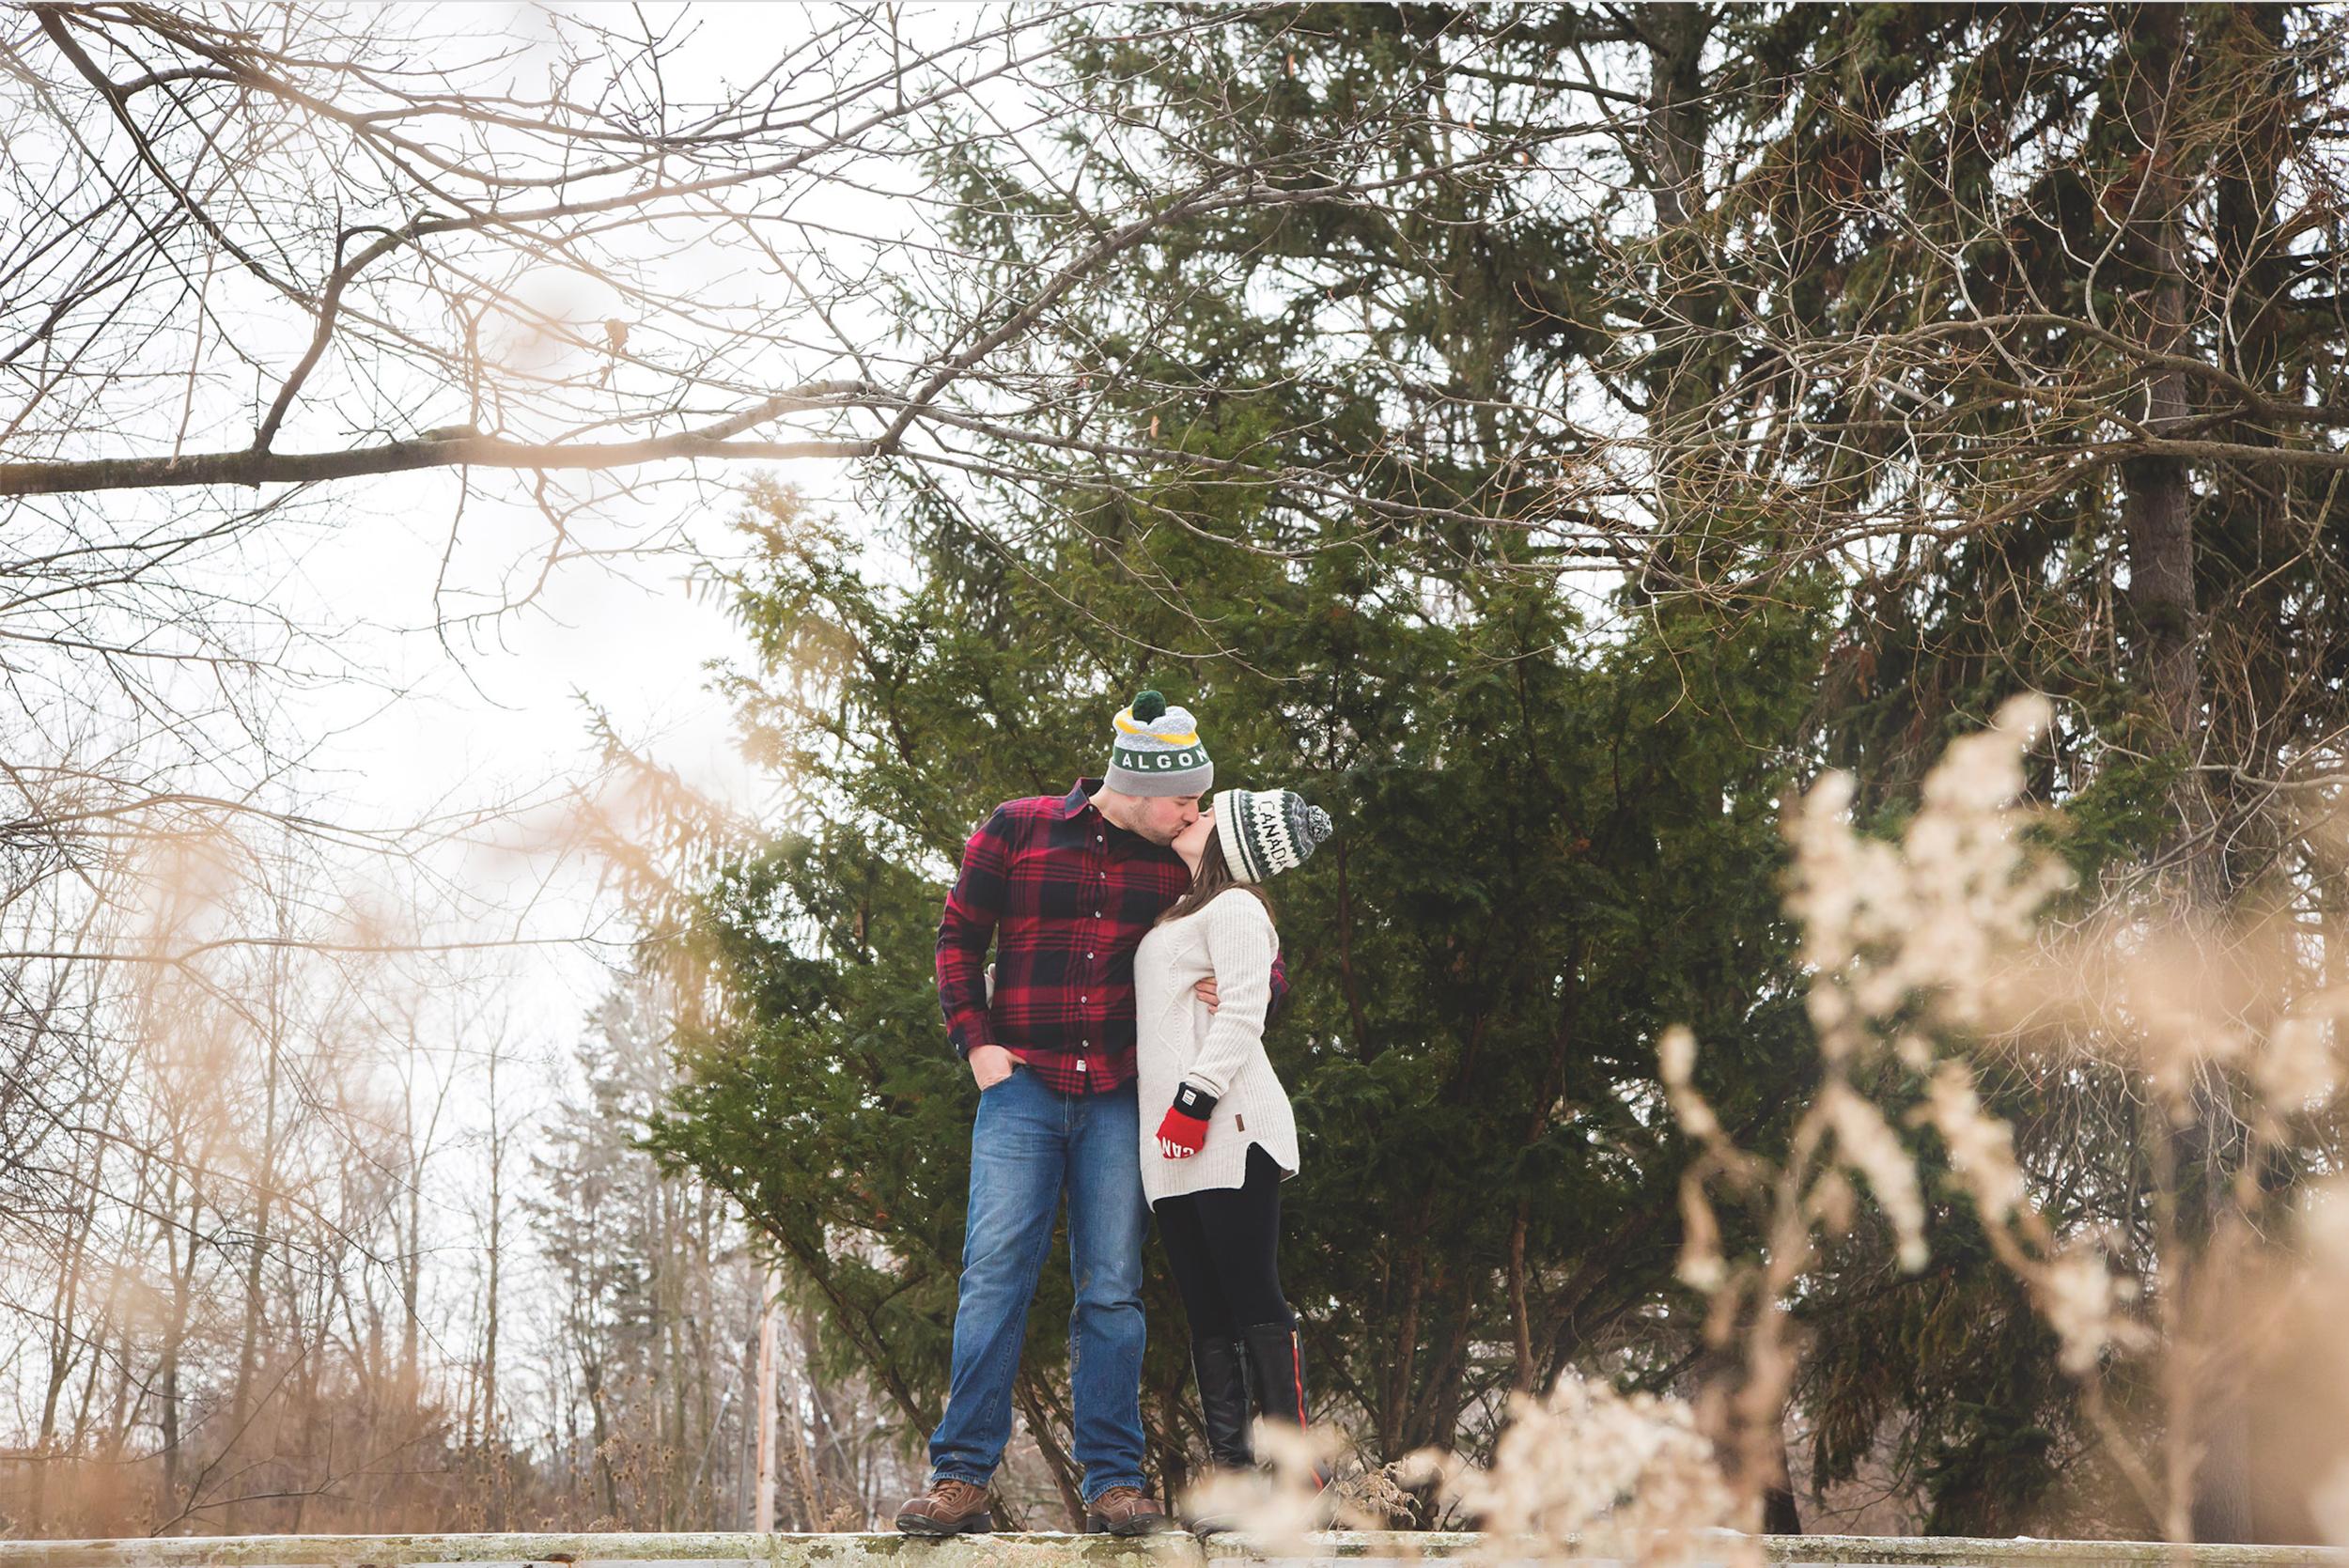 Engagement-Photos-Hamilton-Niagara-Toronto-Burlington-Oakville-Photographer-Engaged-Ring-Photography-Dog-Winter-Moments-by-Lauren-Image-14.png